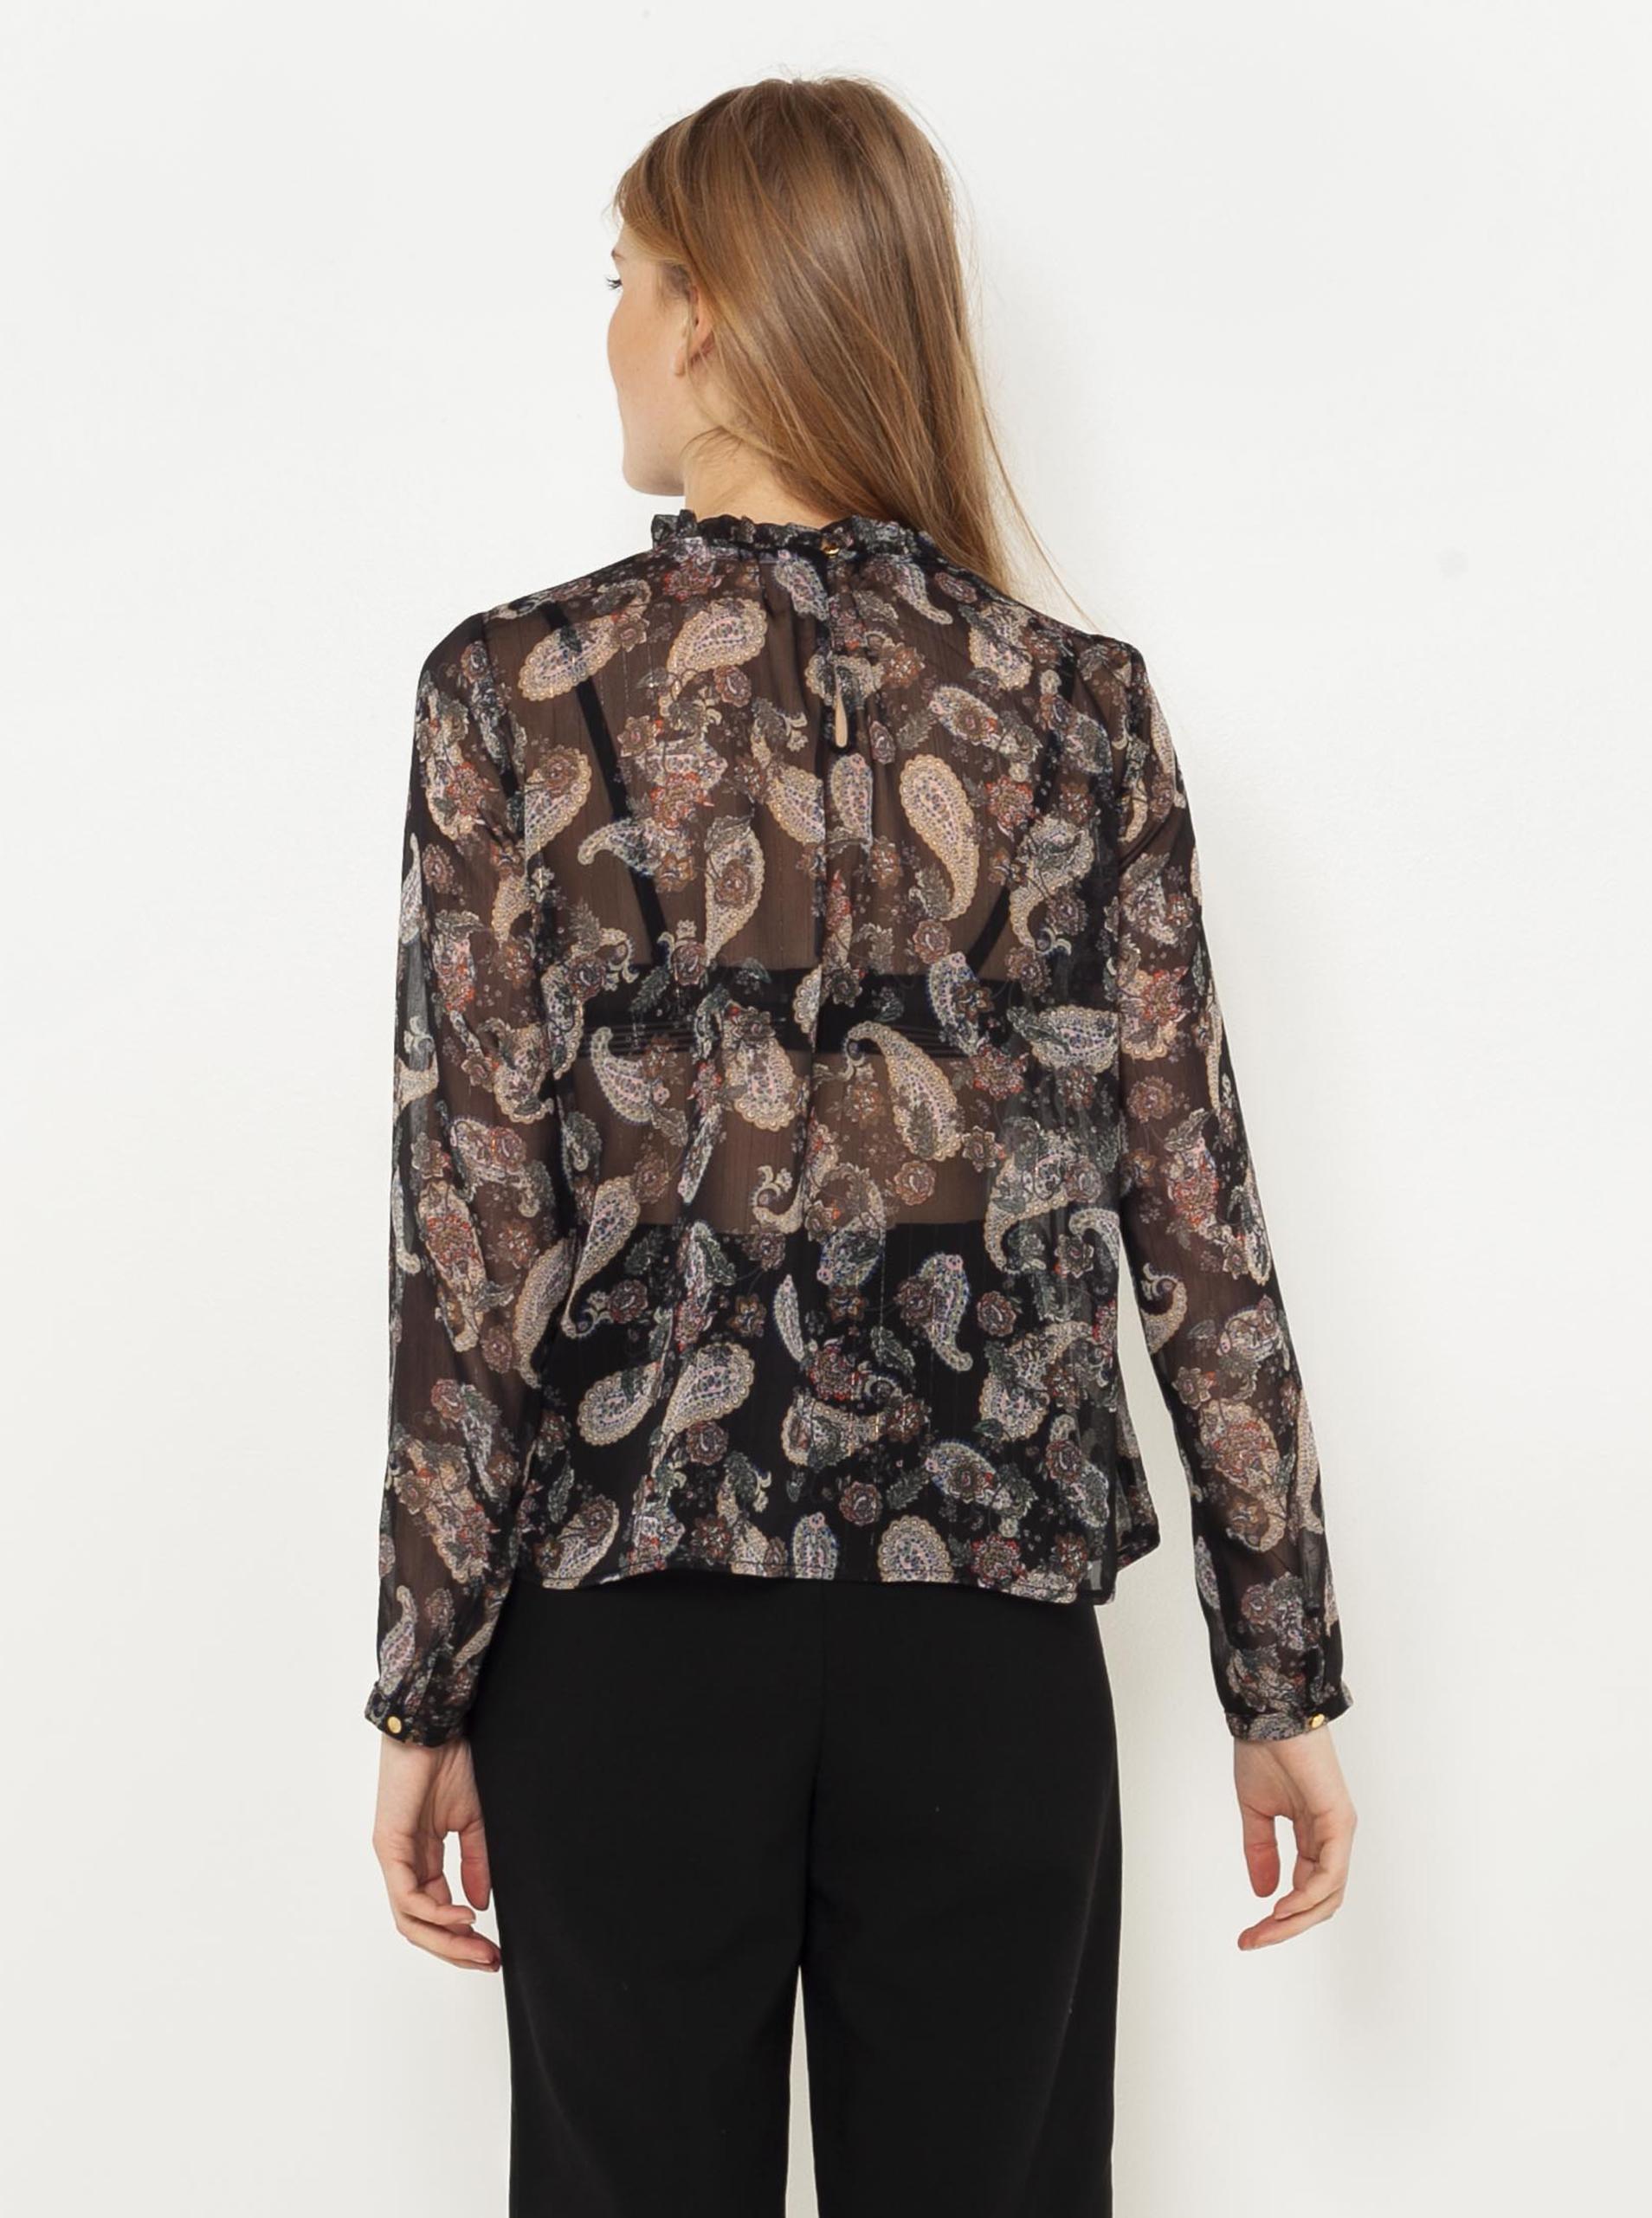 CAMAIEU črna bluza z vzorcem